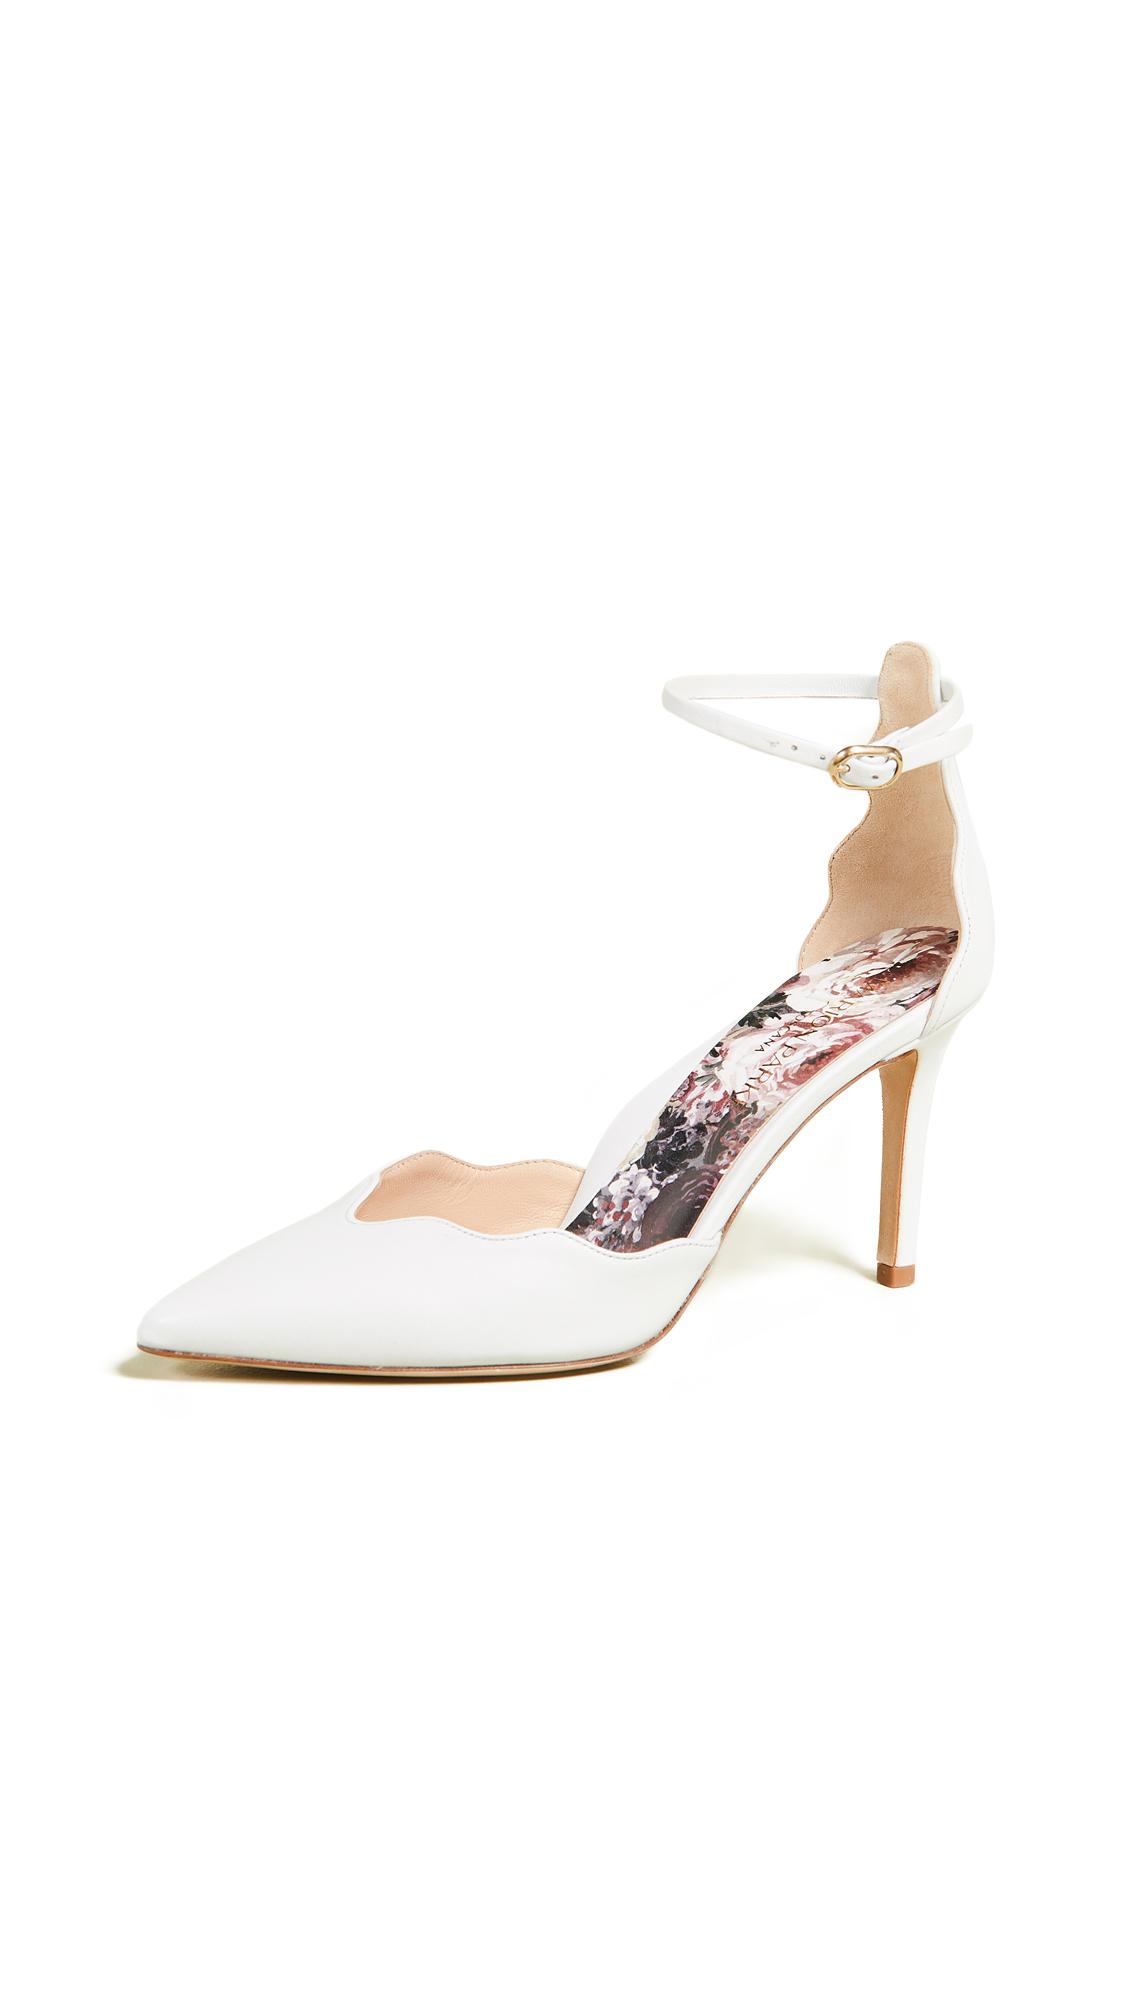 Marion Parke Mara Ankle Strap Pumps - White